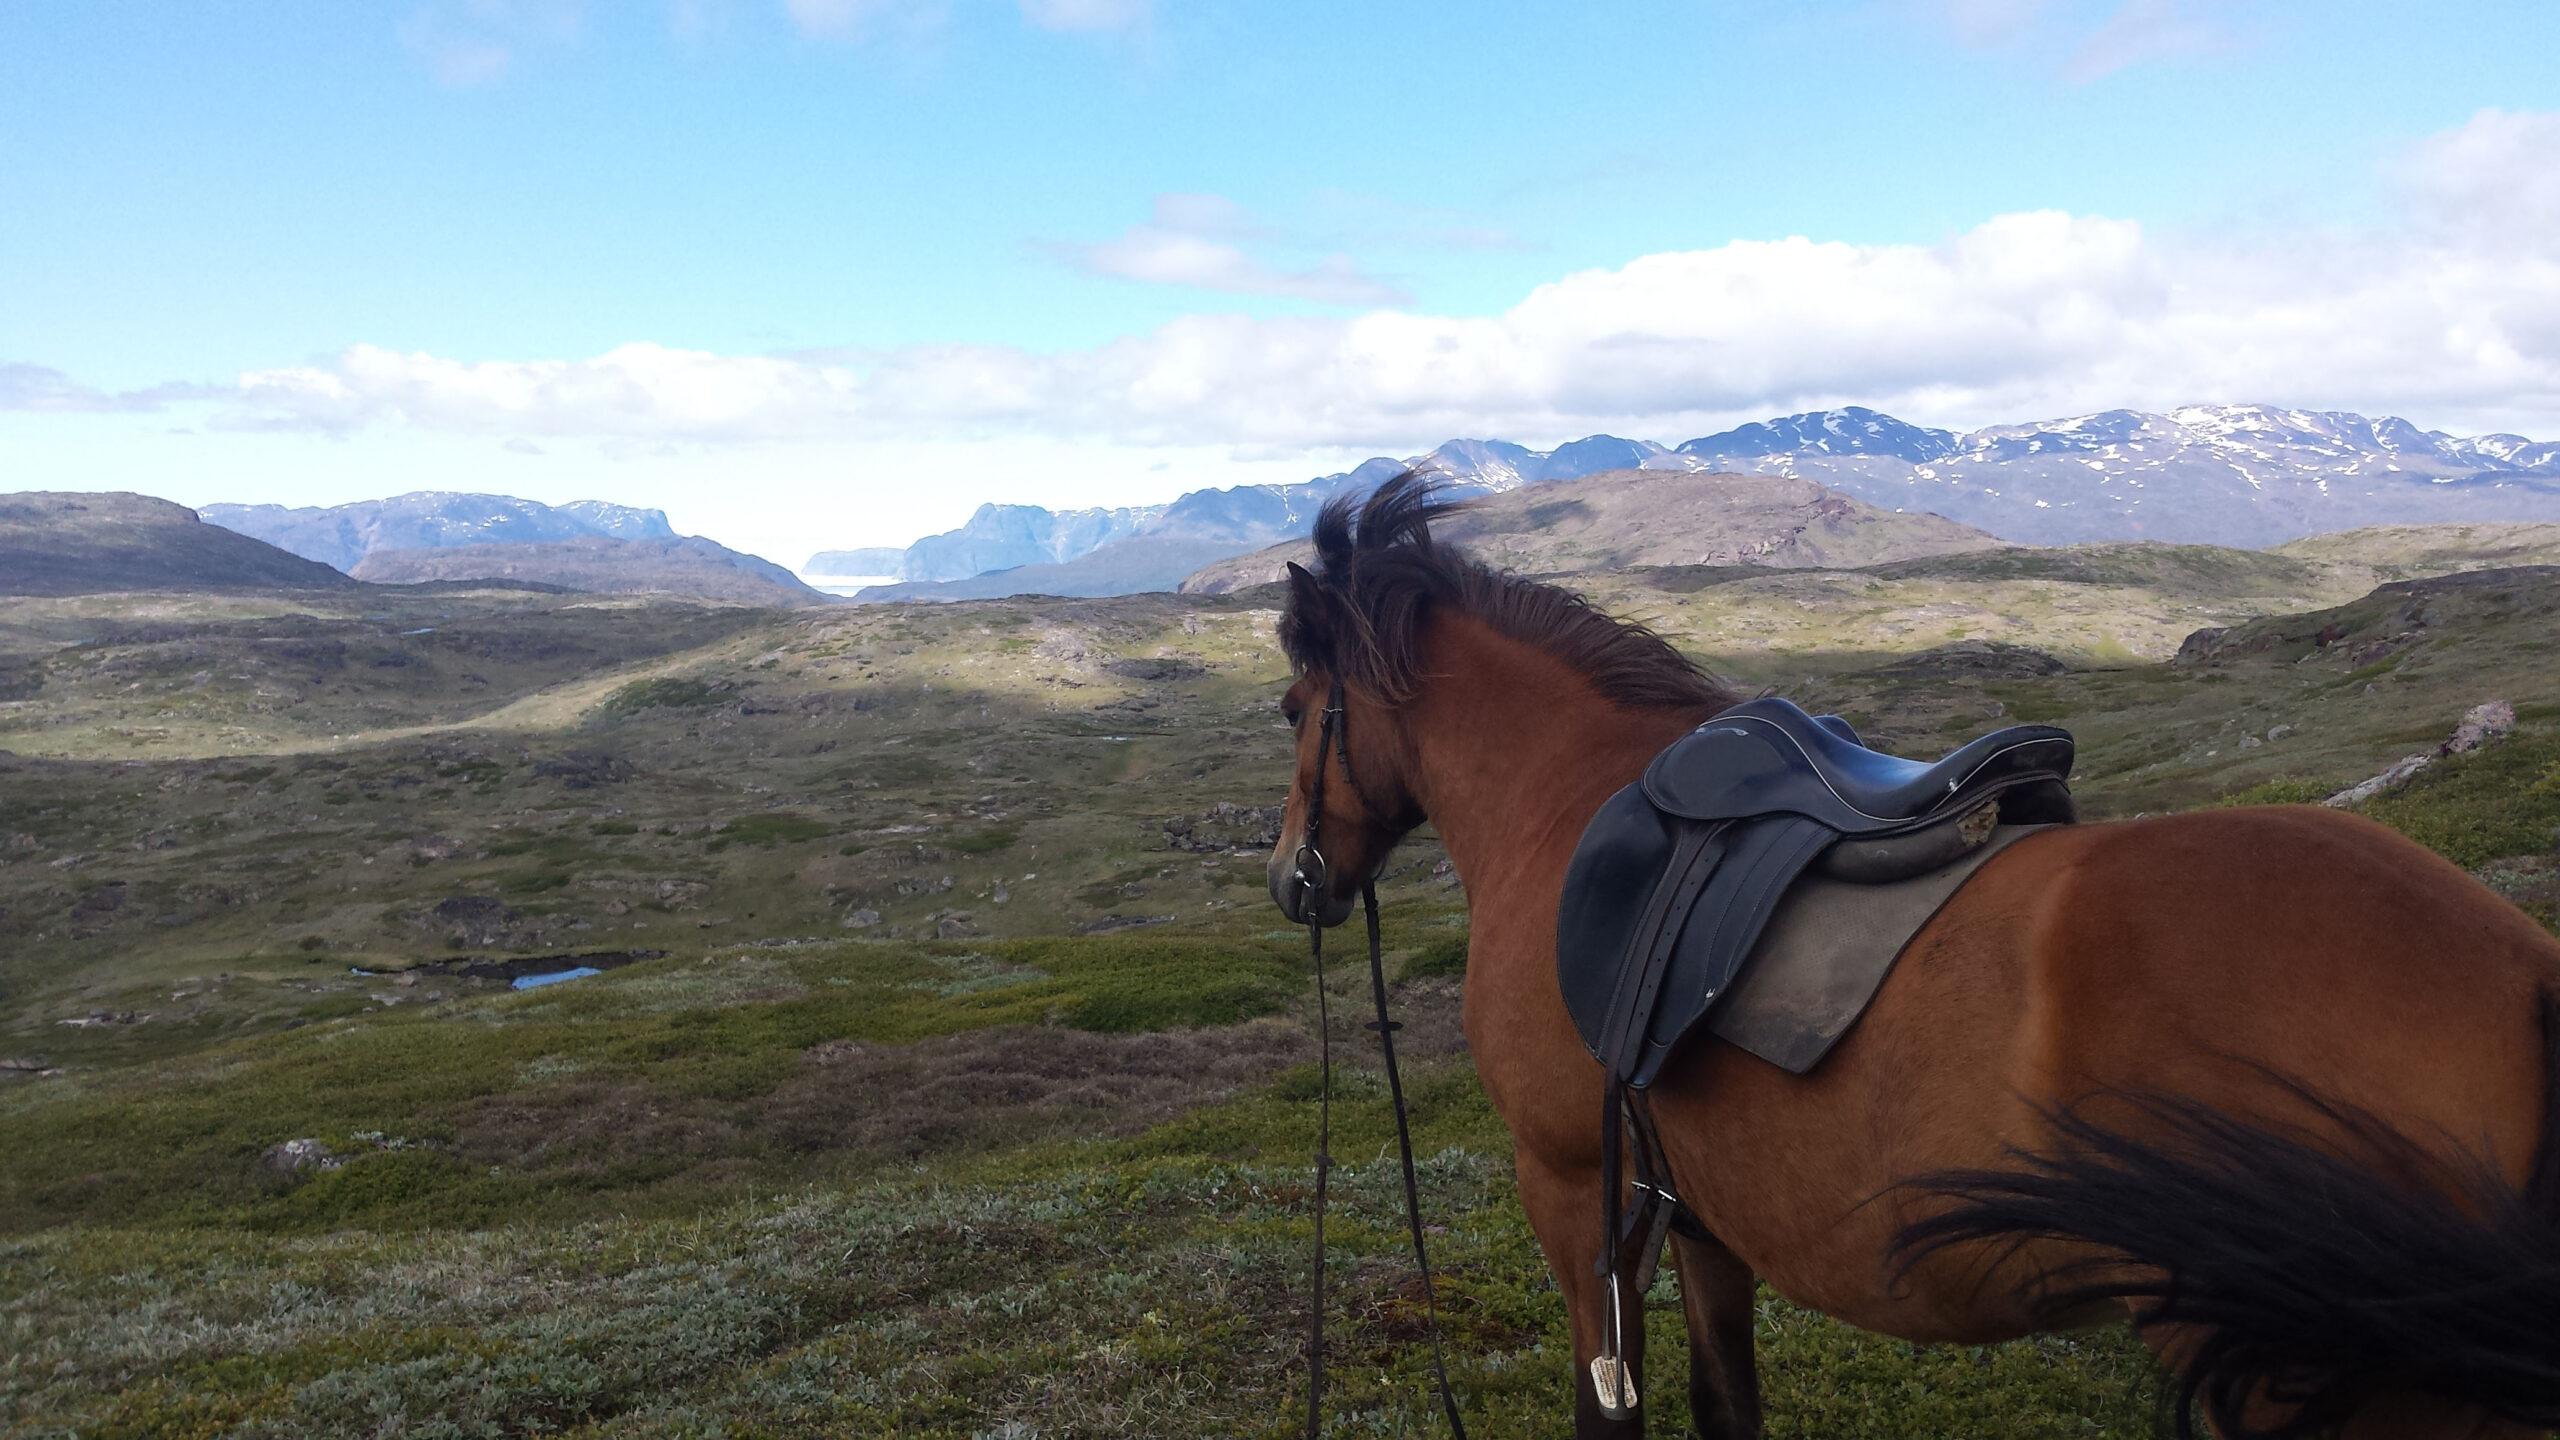 Puur natuur in Groenland - Vakantie te paard / Reisbureau Perlan